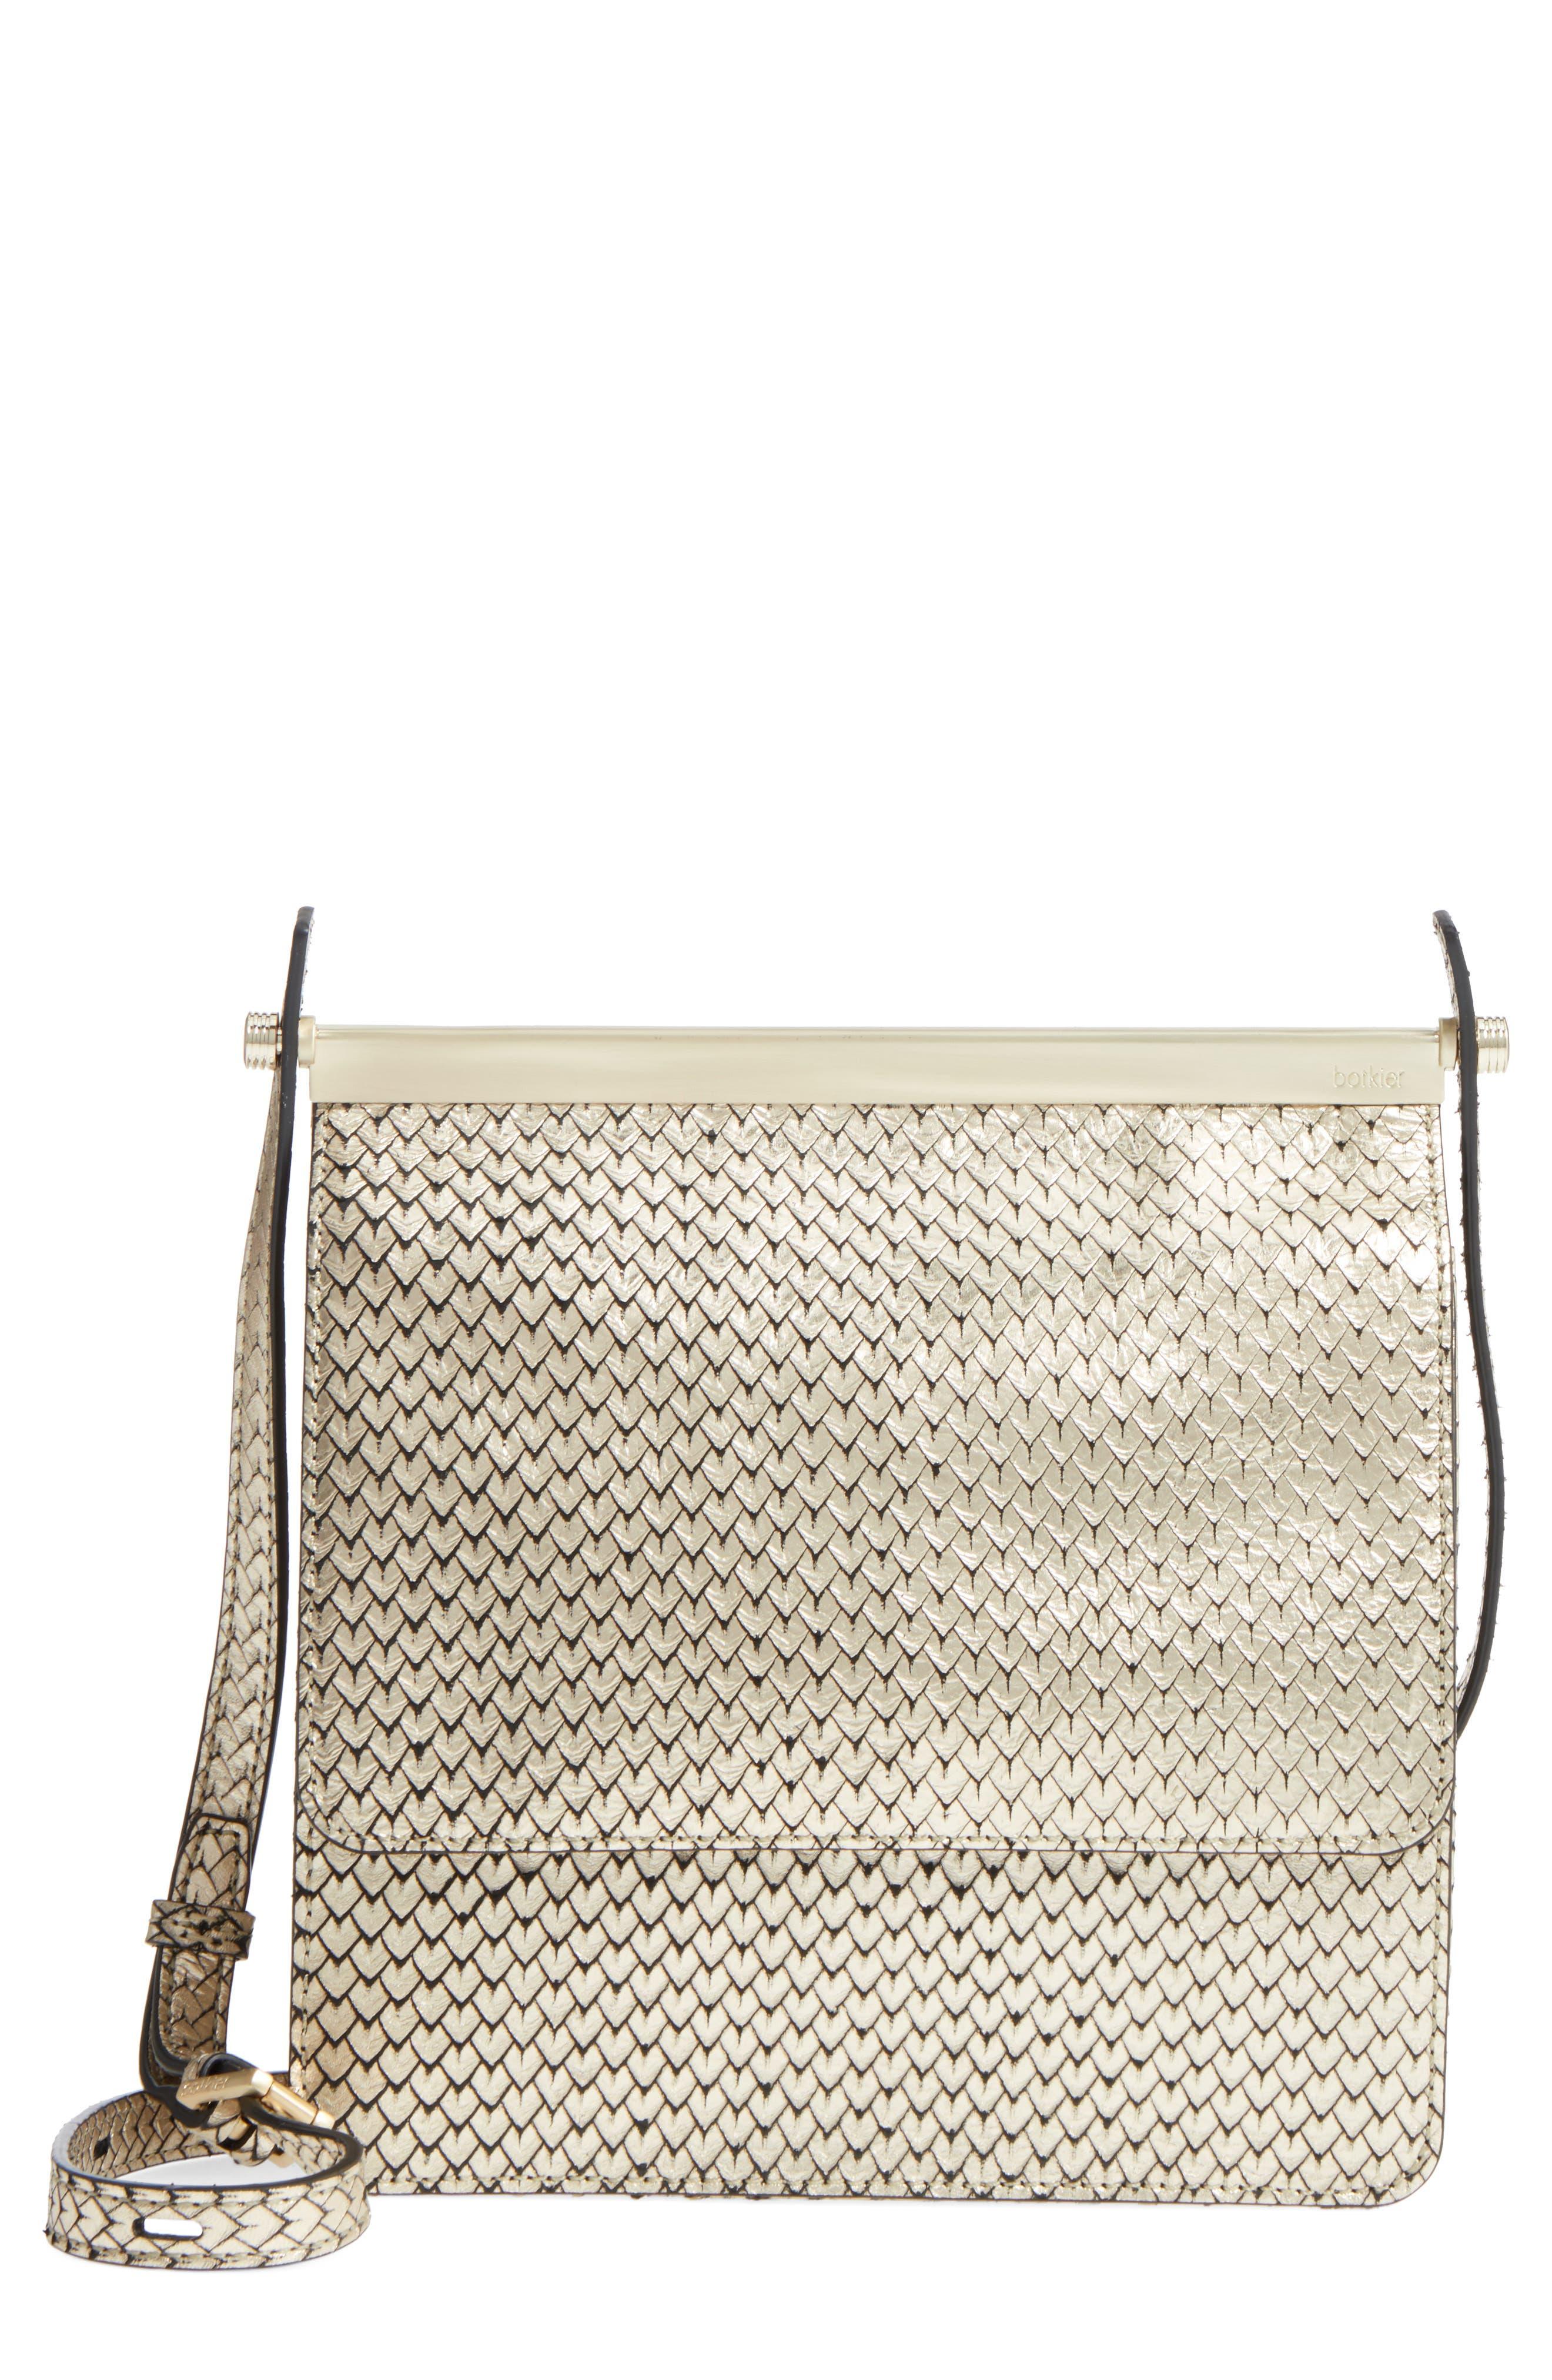 Crawford Calfskin Leather Crossbody Bag,                             Main thumbnail 3, color,